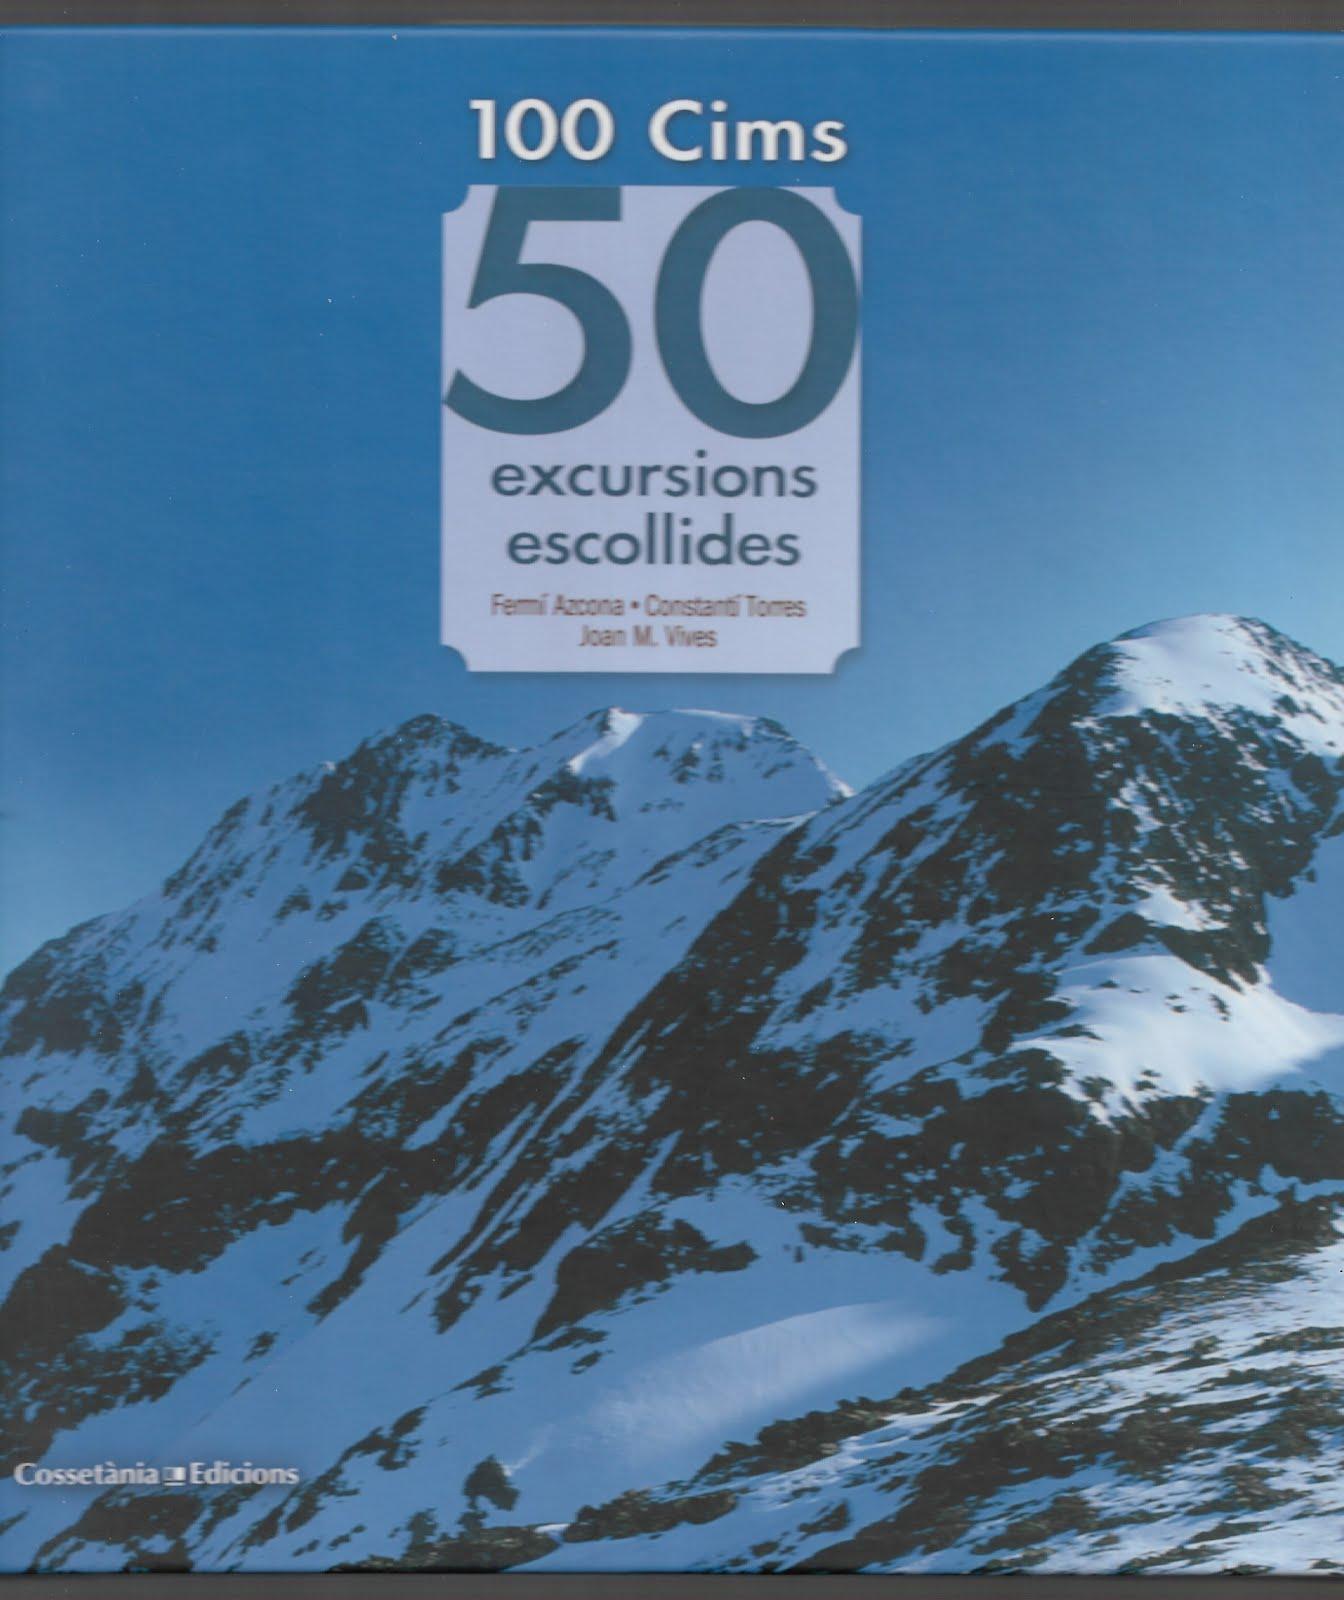 100 CIMS. 50 EXCURSIONS ESCOLLIDES